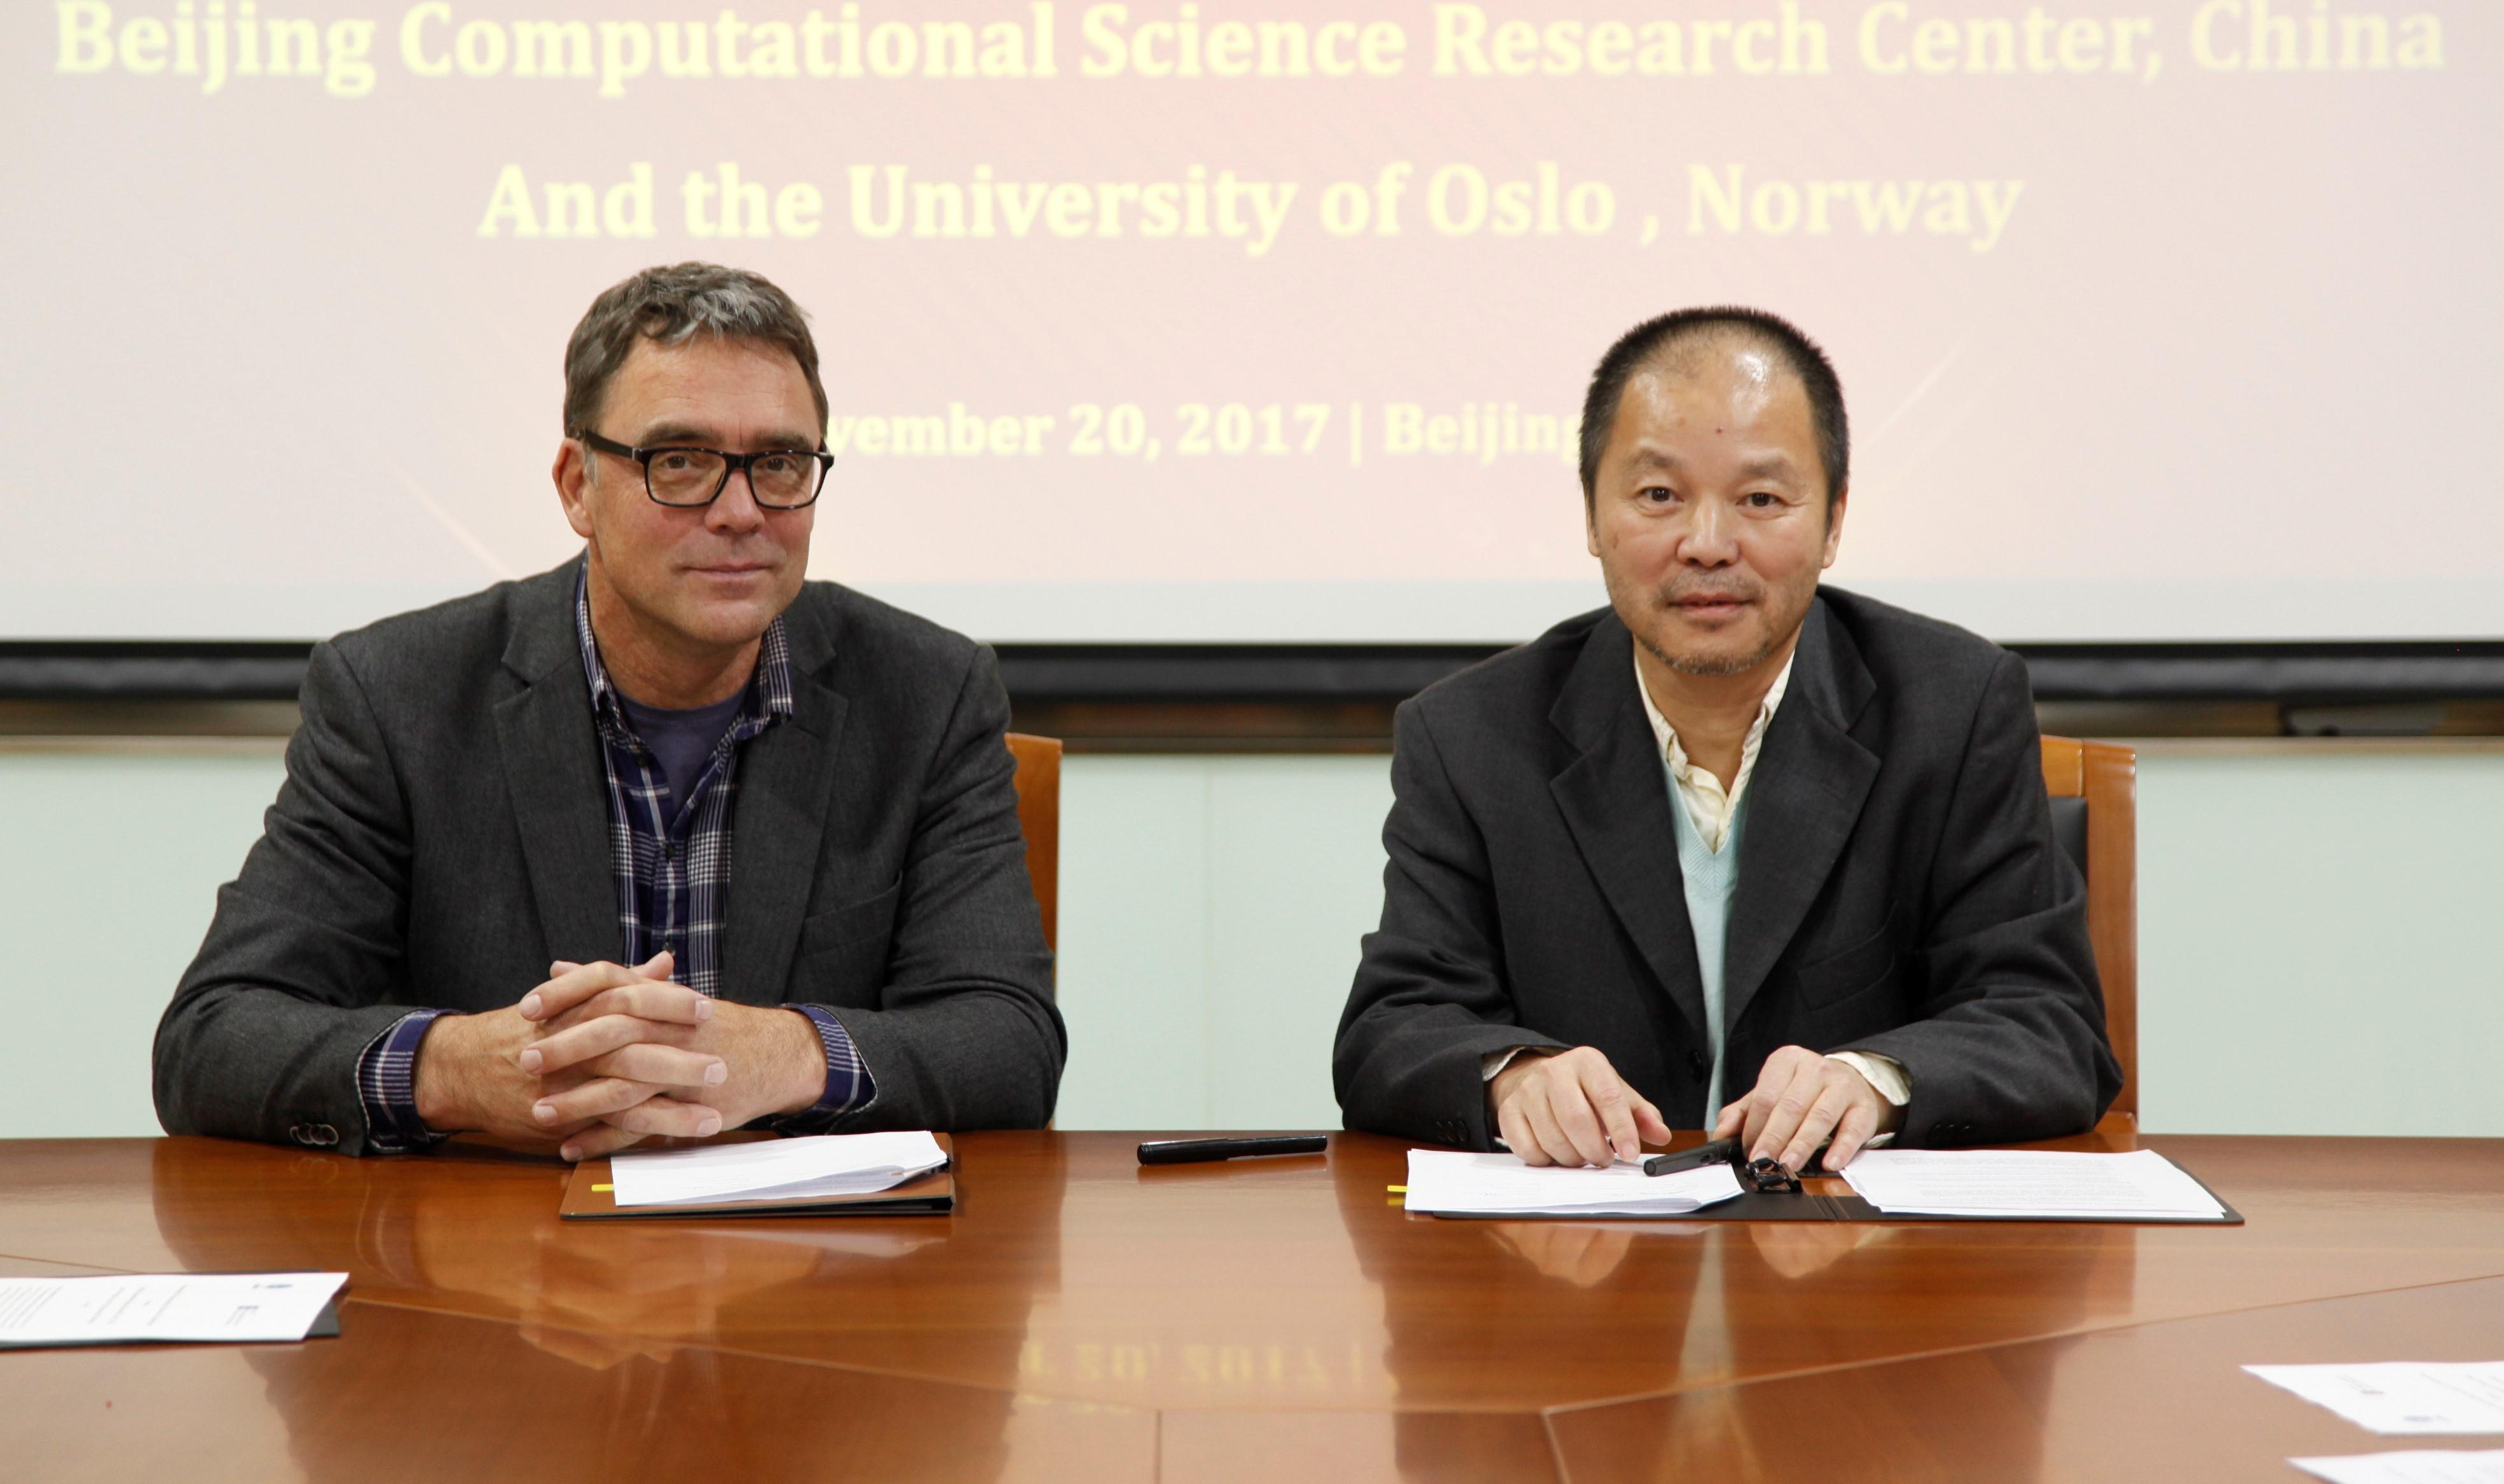 Cooperative Agreement Signed Between Beijing Computational Science